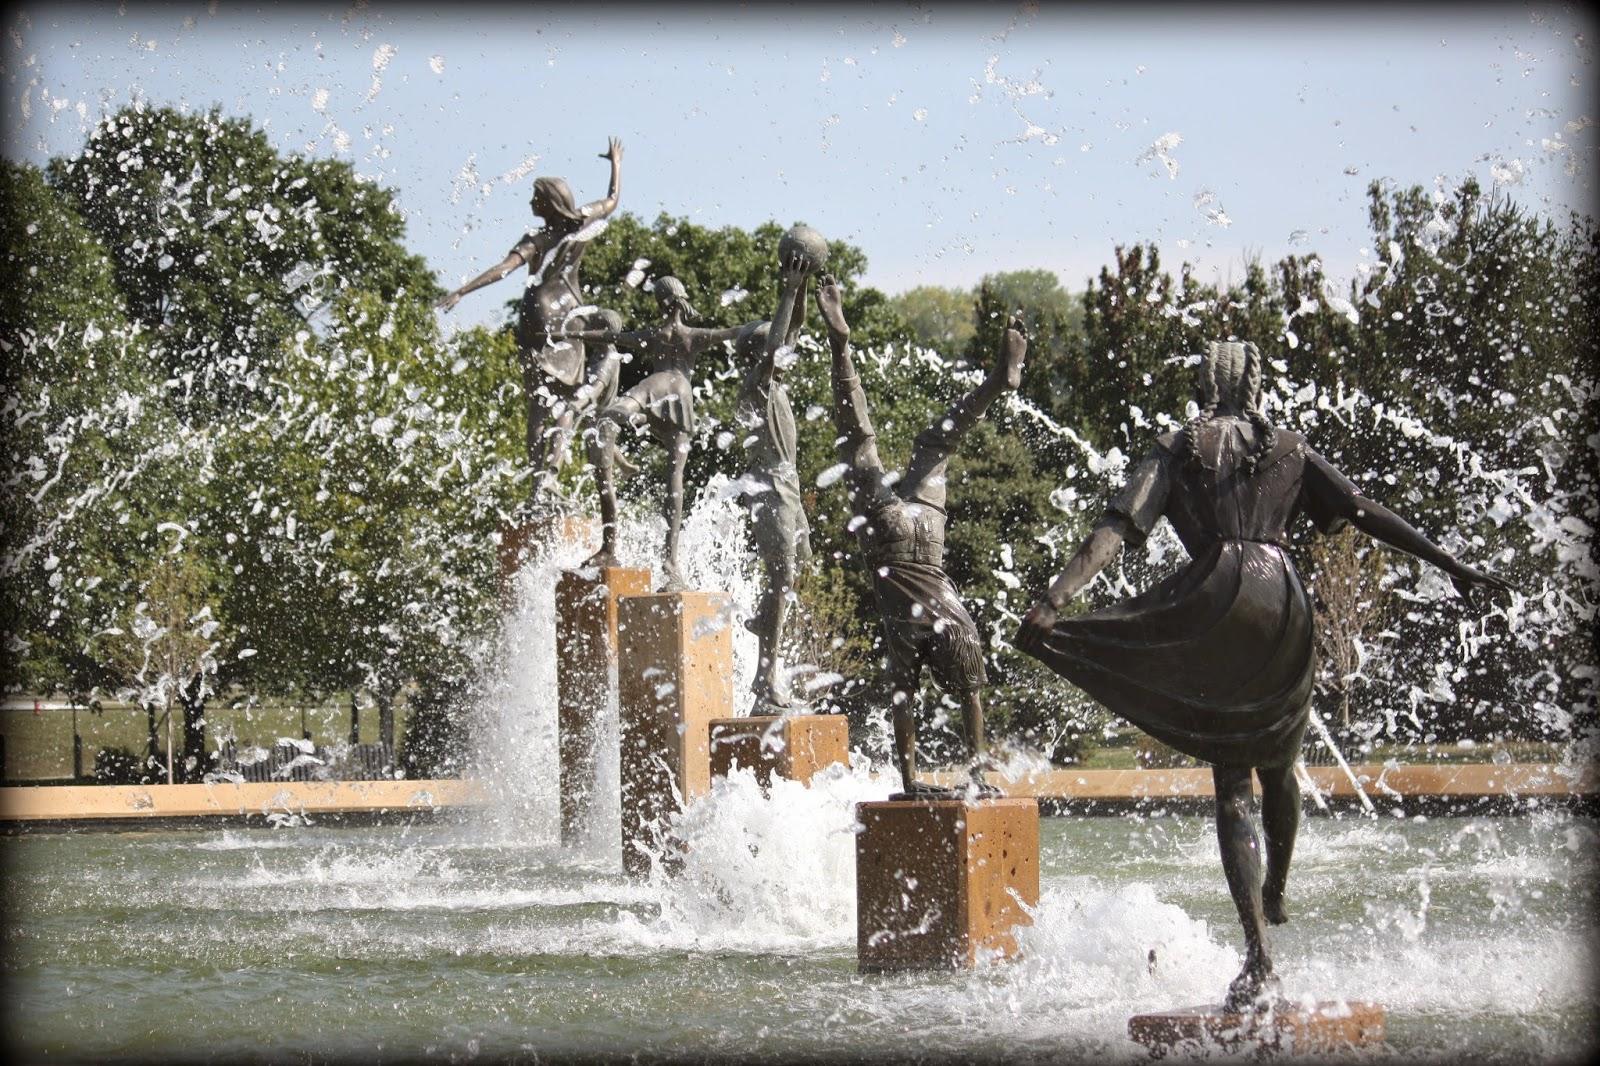 tour of missouri kansas city fountains. Black Bedroom Furniture Sets. Home Design Ideas